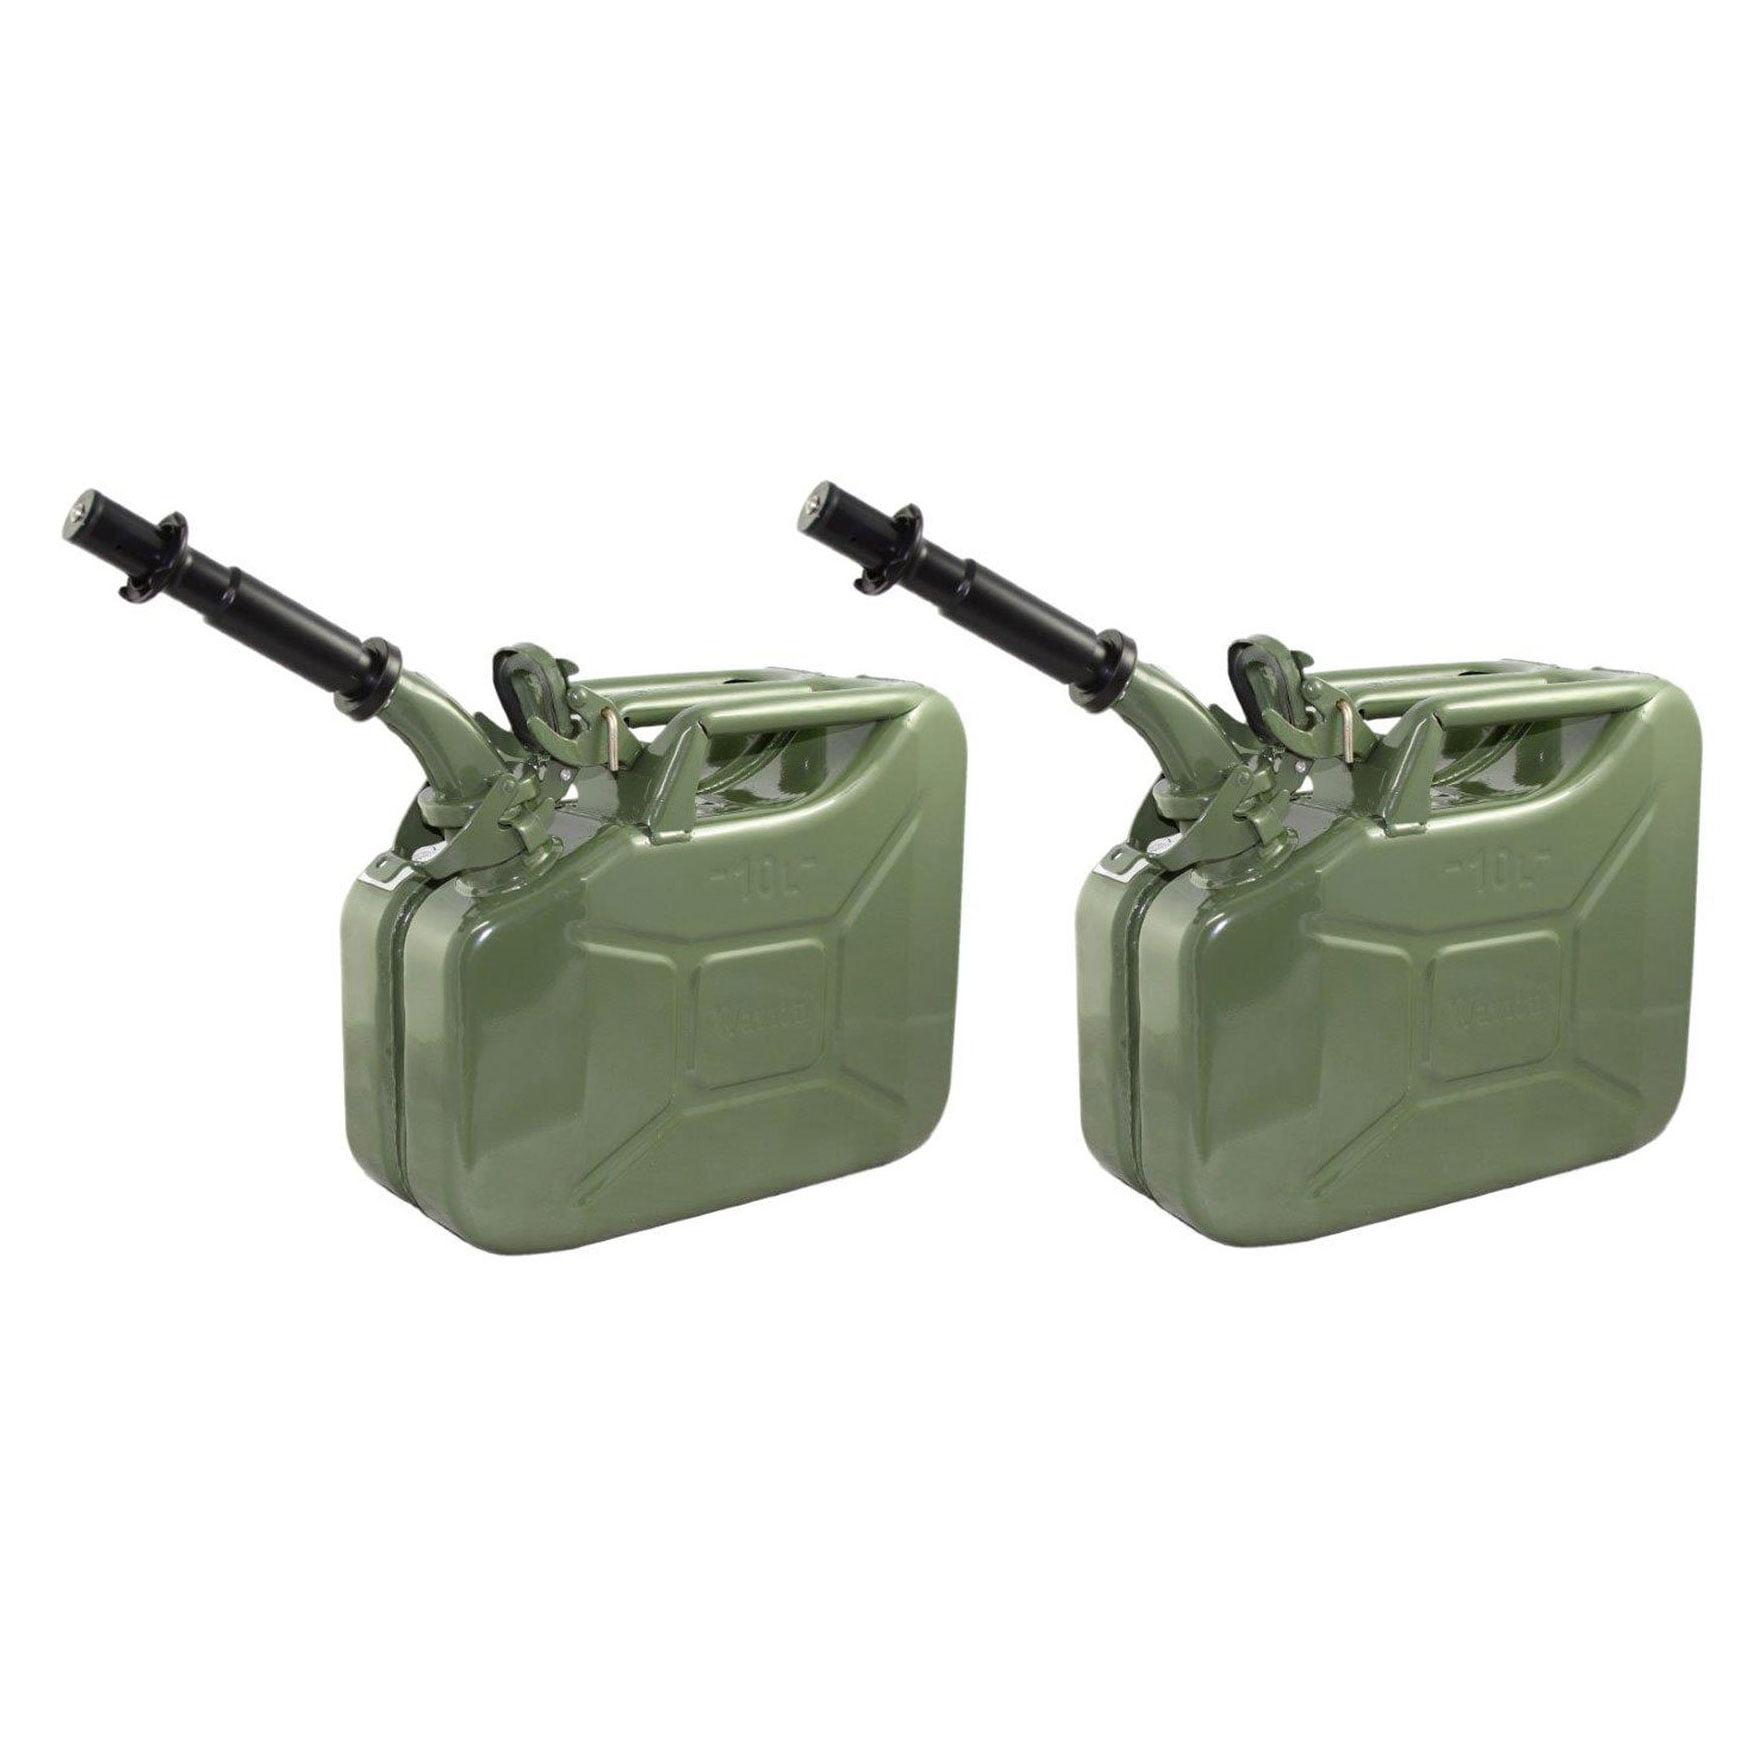 2 Pack Wavian 3013 2.6 Gal 10L Steel Gasoline Fuel Jerry Cans w/ Spout, Green